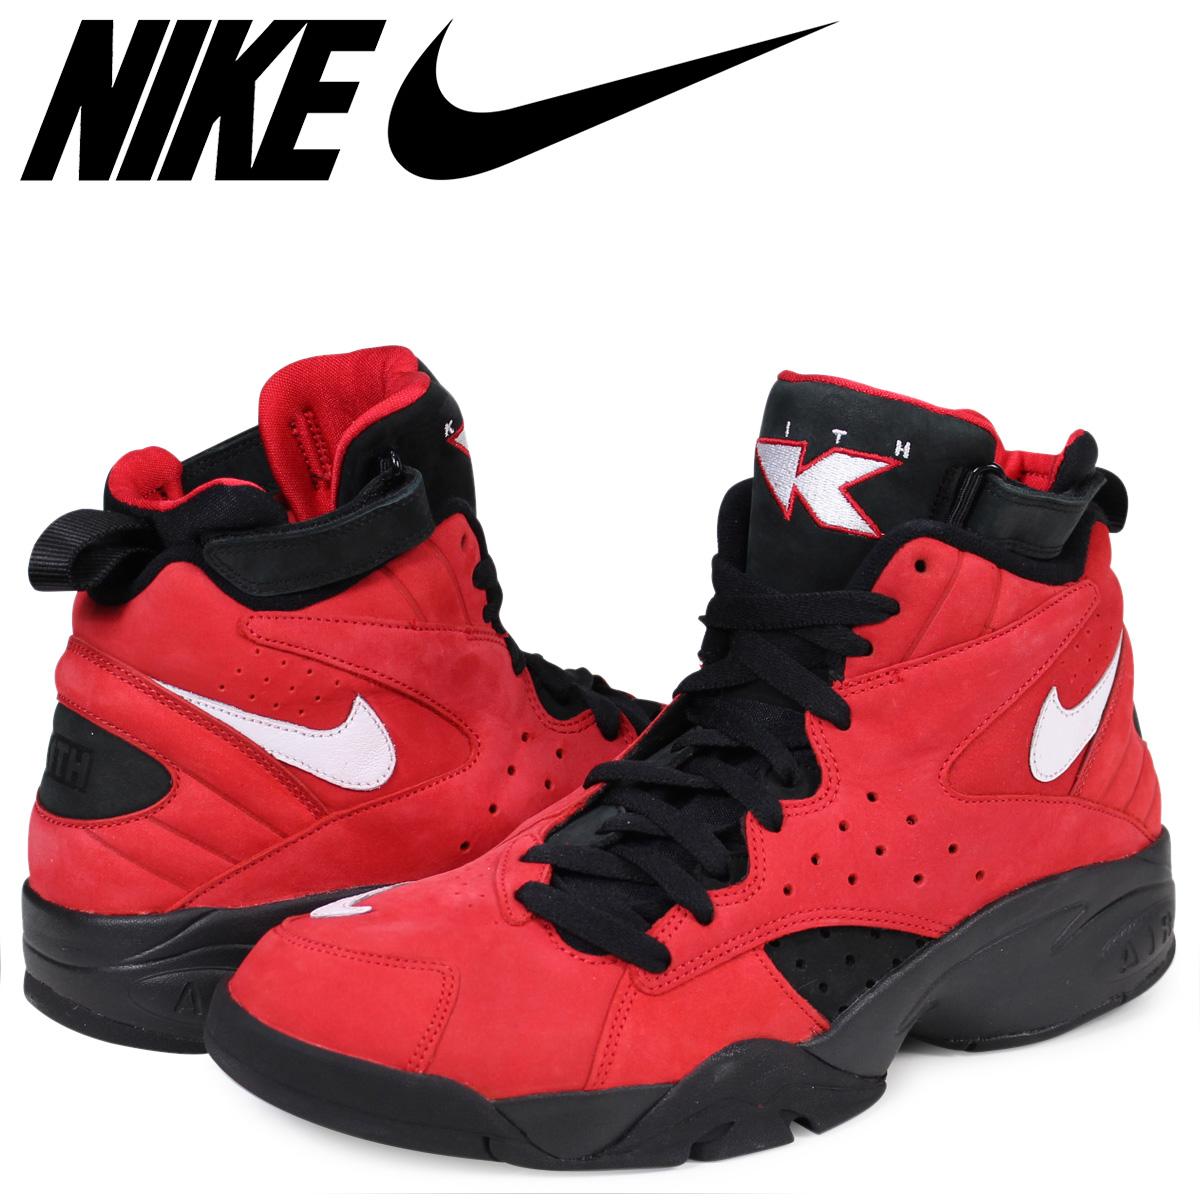 99fa19170c NIKE Nike KITH air maestro 2 sneakers AIR MAESTRO 2 QS NKAH1069-600 men red  ...